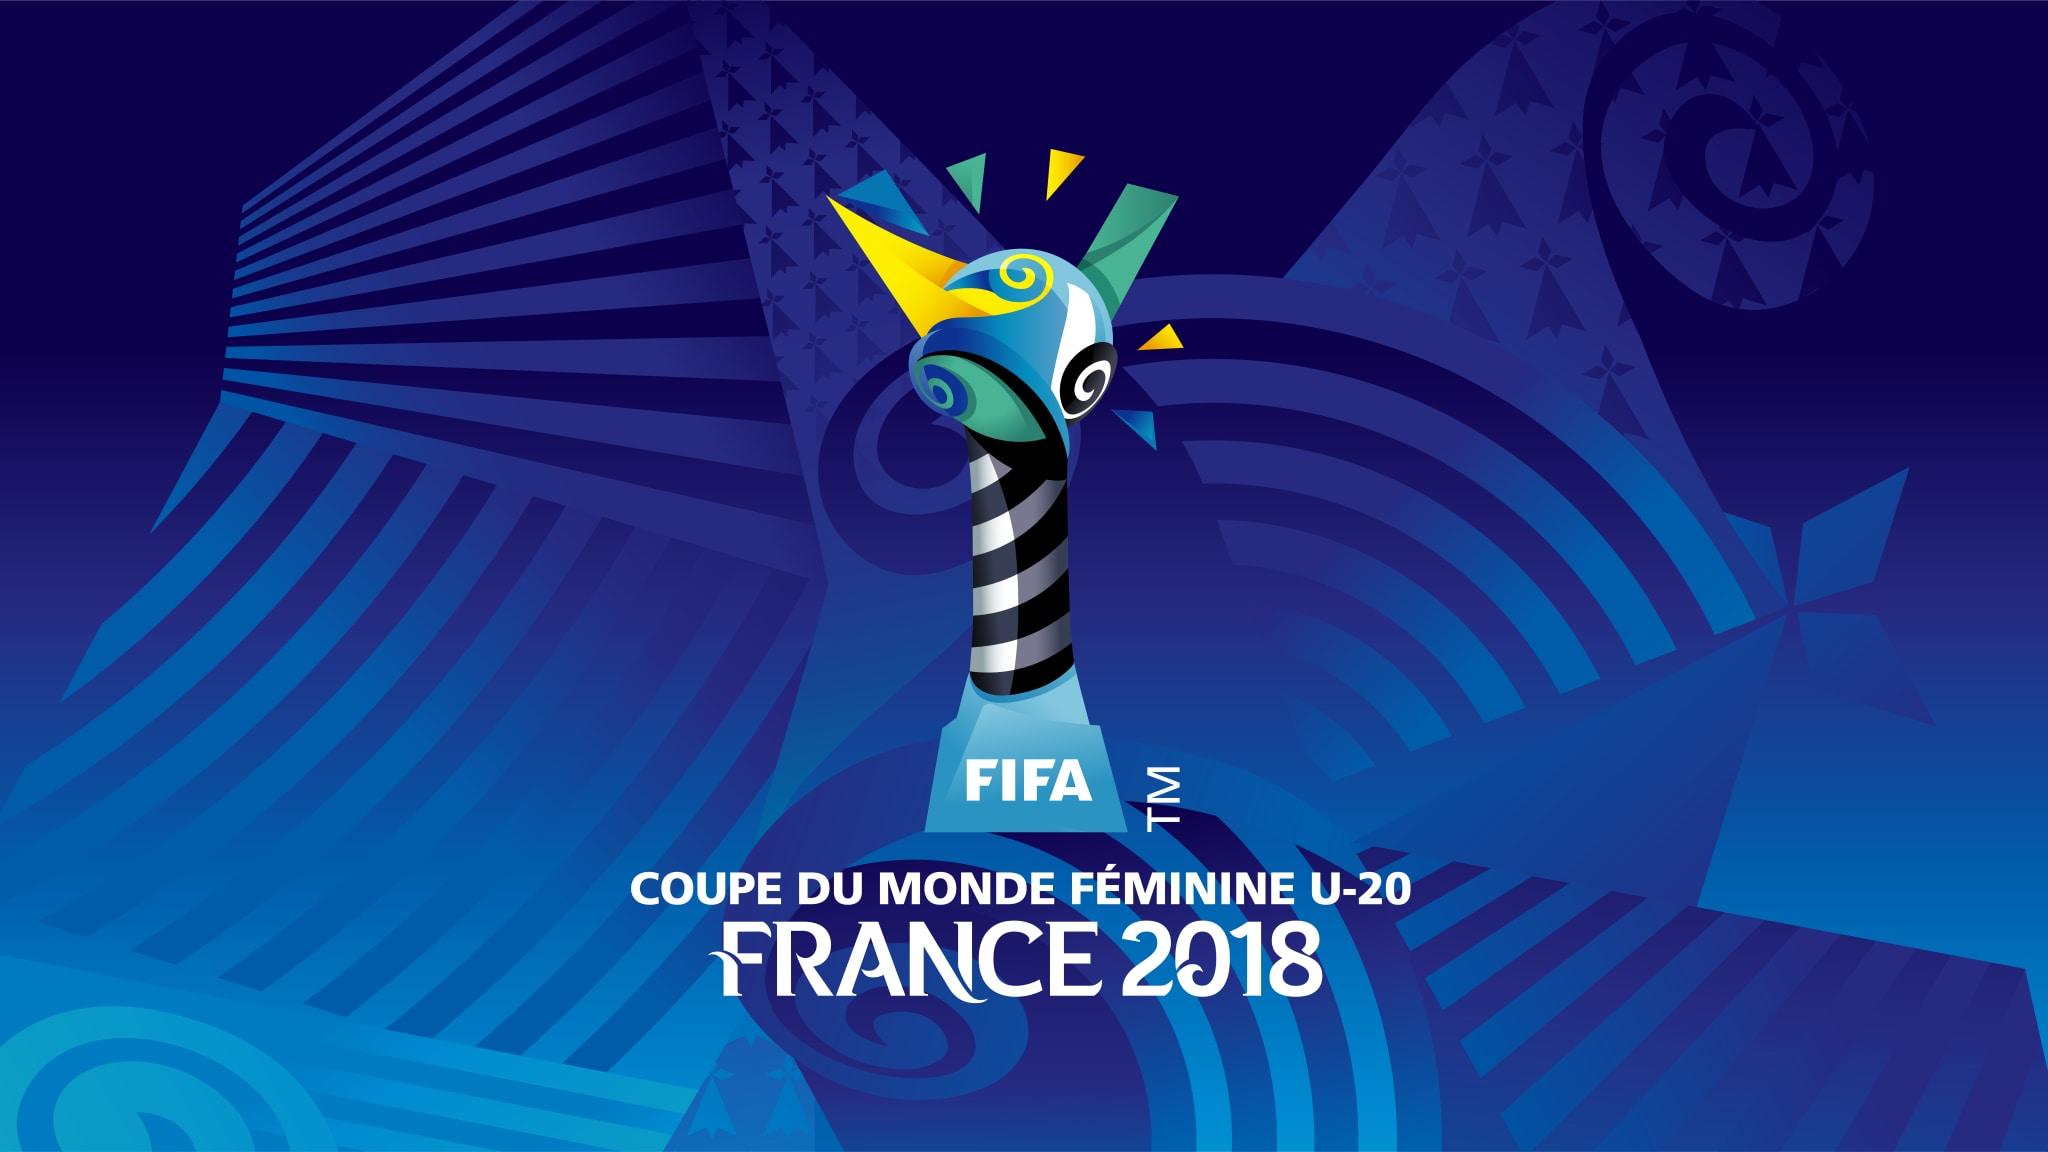 FIFA – COUPE DU MONDE FÉMININE U-20, FRANCE 2018